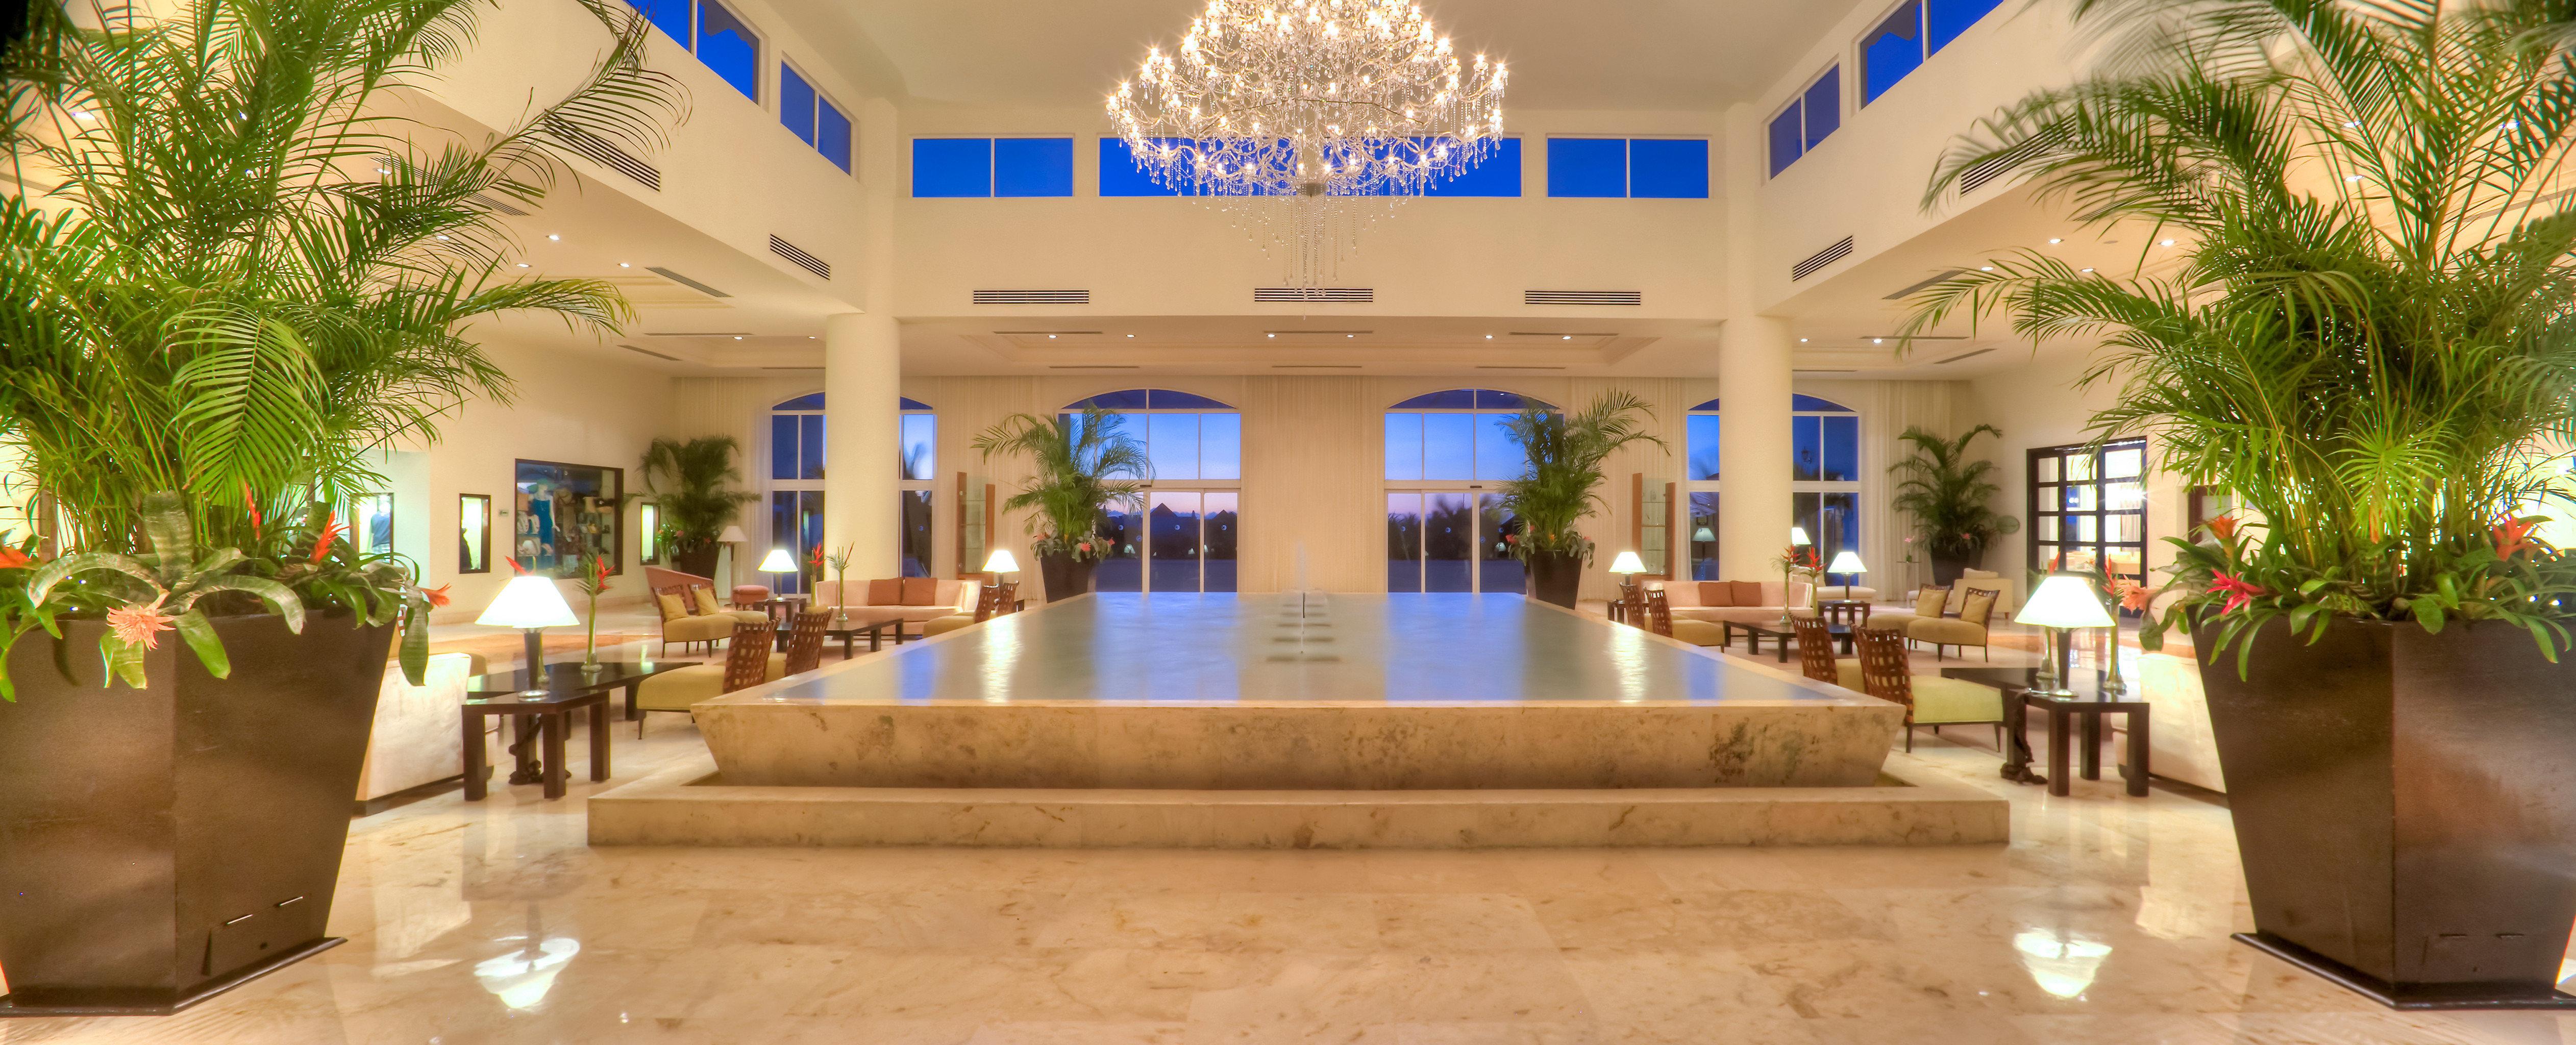 Elegant Lobby Lounge leisure building Resort shopping mall plaza plant Modern